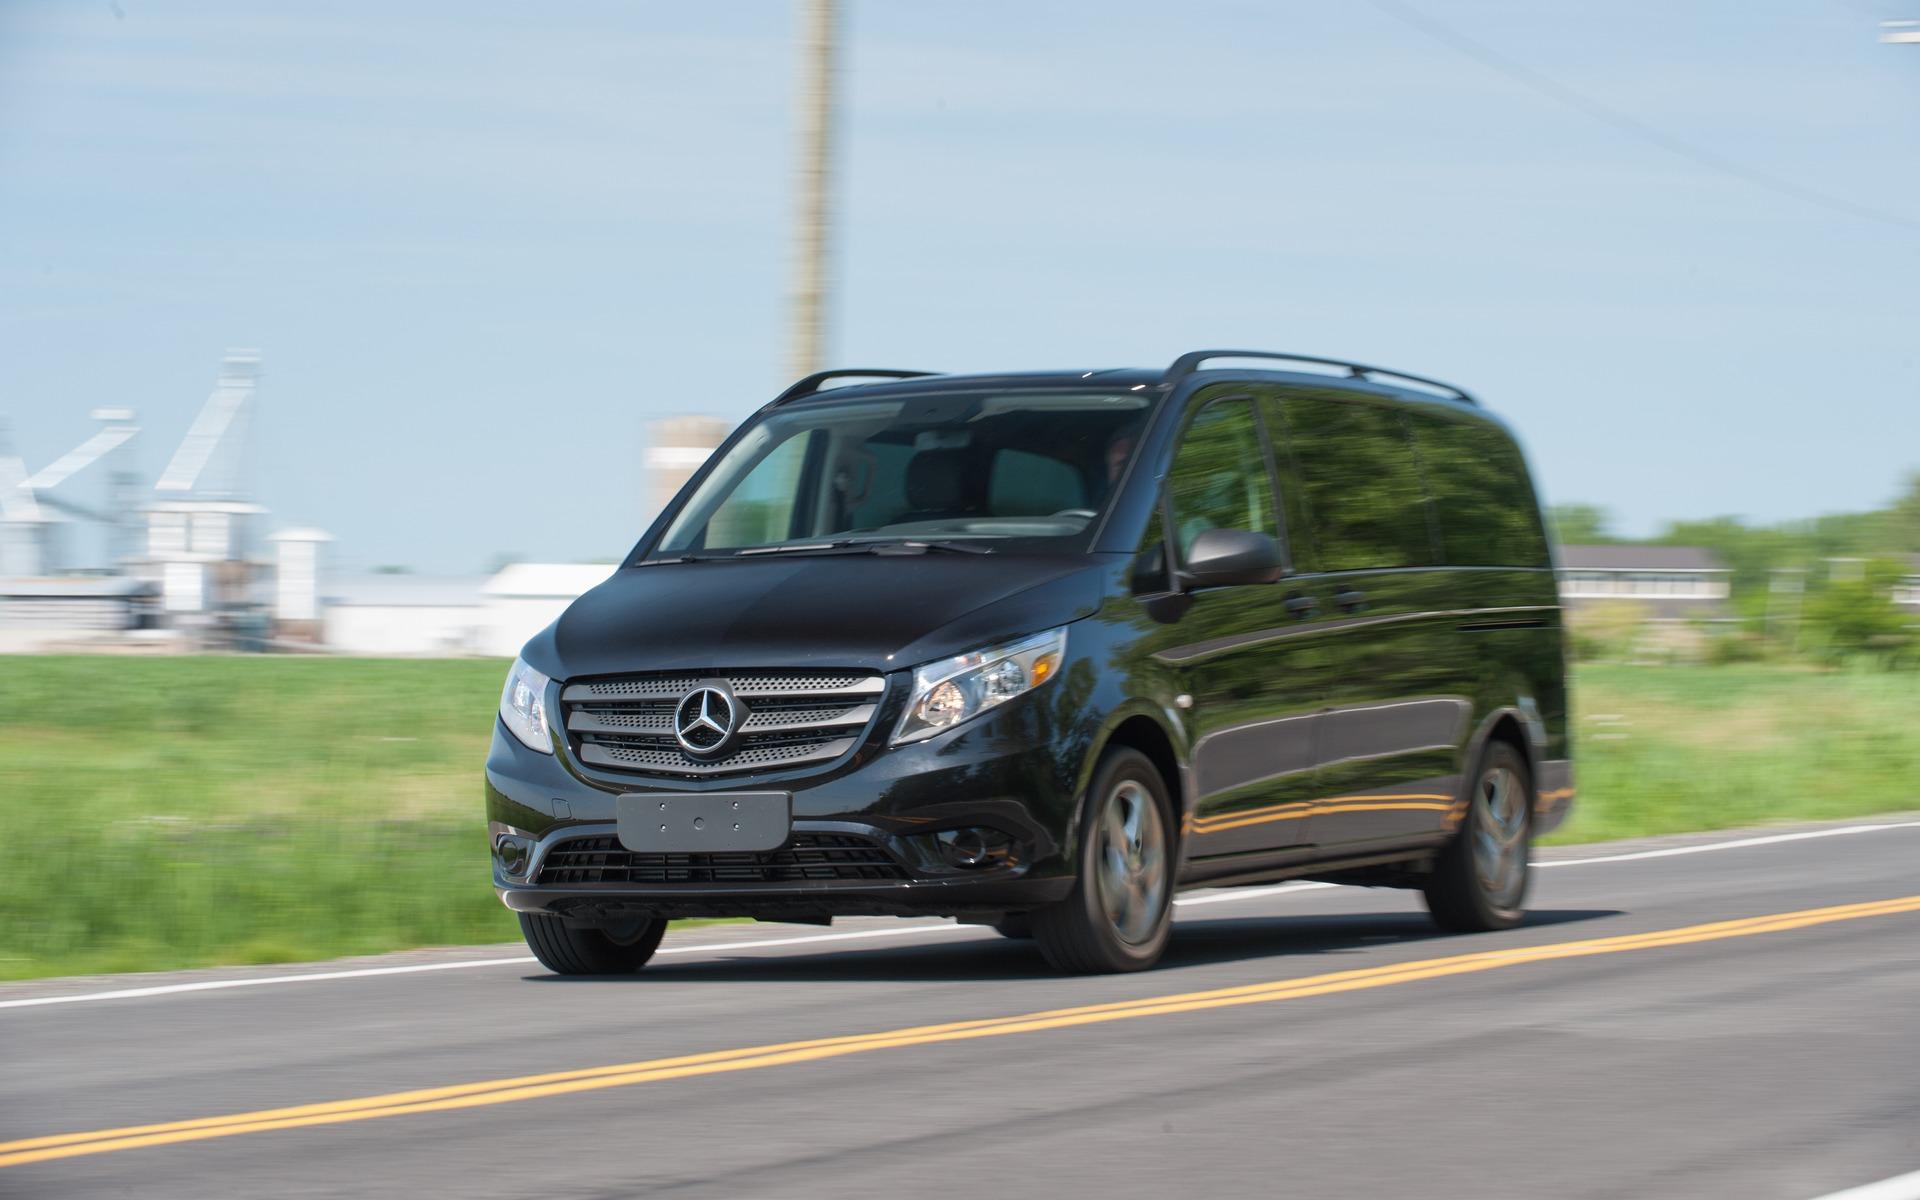 <p>#5. Mercedes-Benz Metris</p>